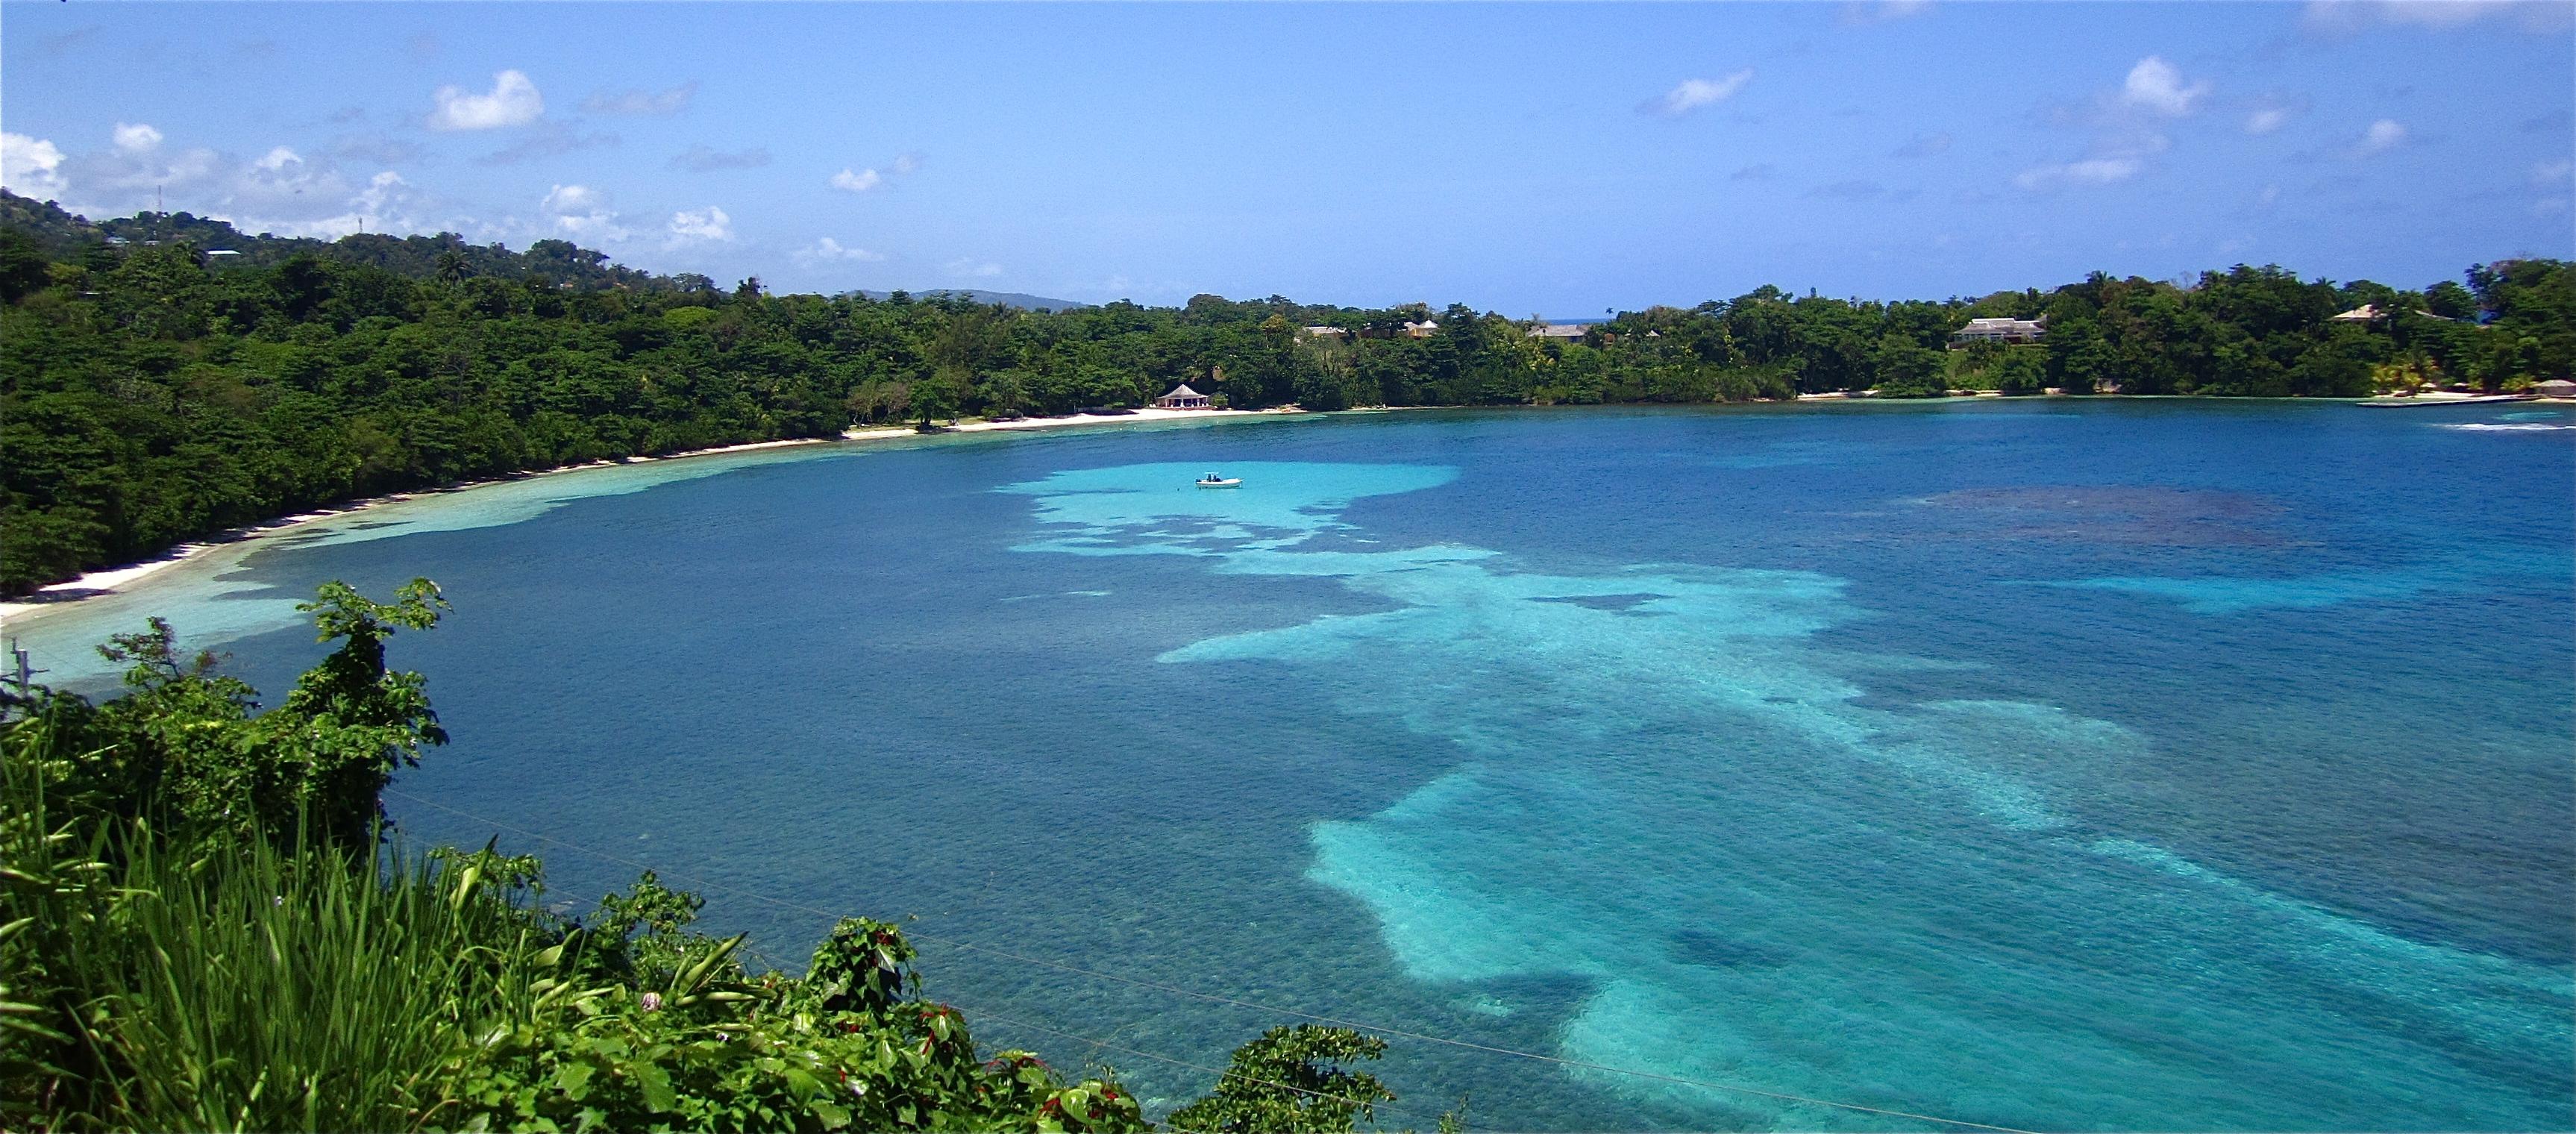 jamaica-yacht-charter-jamaica-yacht-rental-jamaica-boat-charter-jamaica-boat-rental-jamaica-sailing-charter-beach